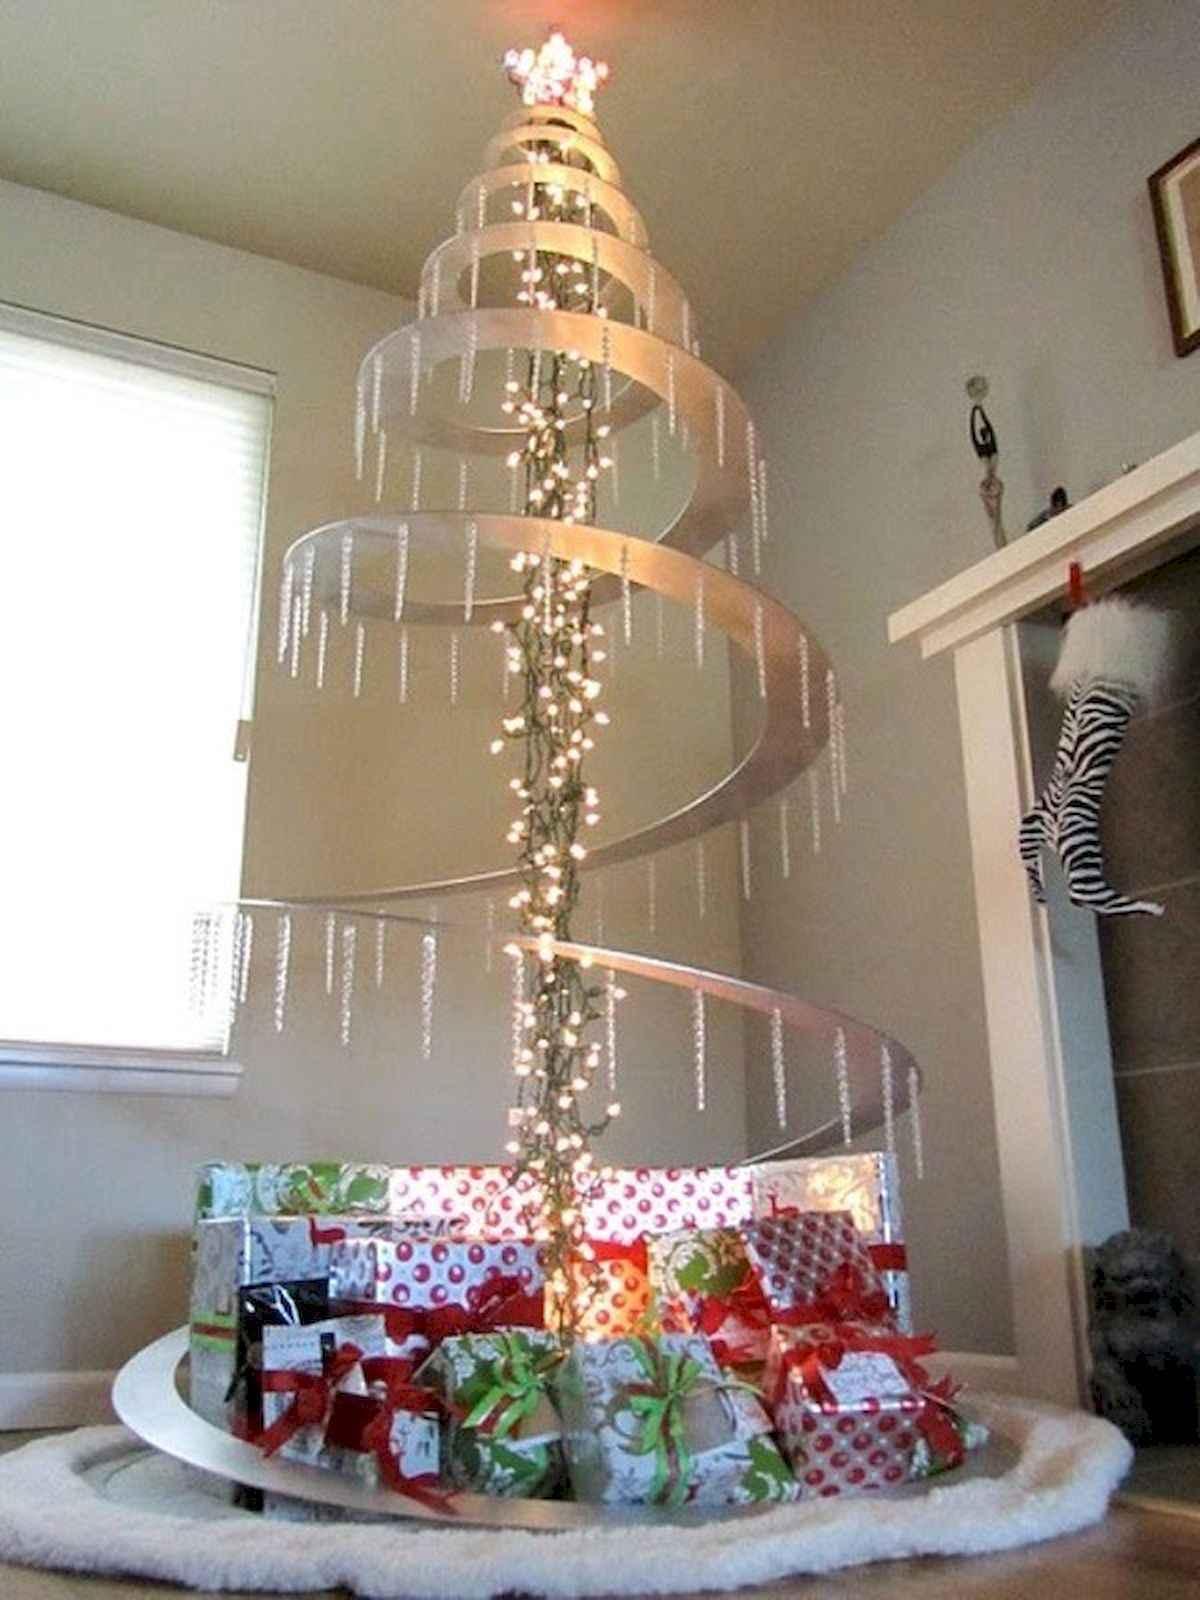 50 diy christmas decorations ideas (33)